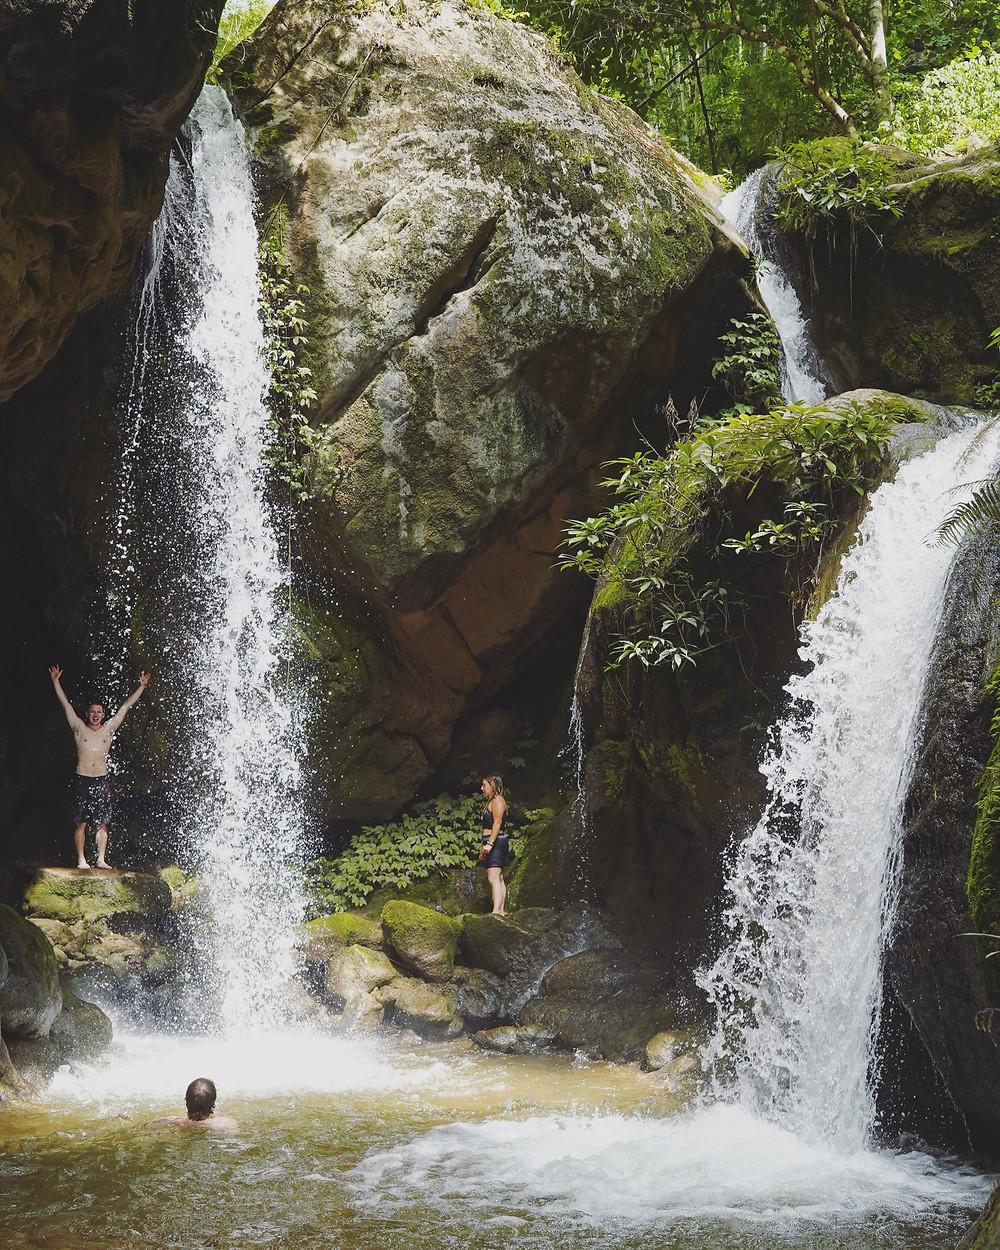 拜县瀑布 Hua Chang Waterfall